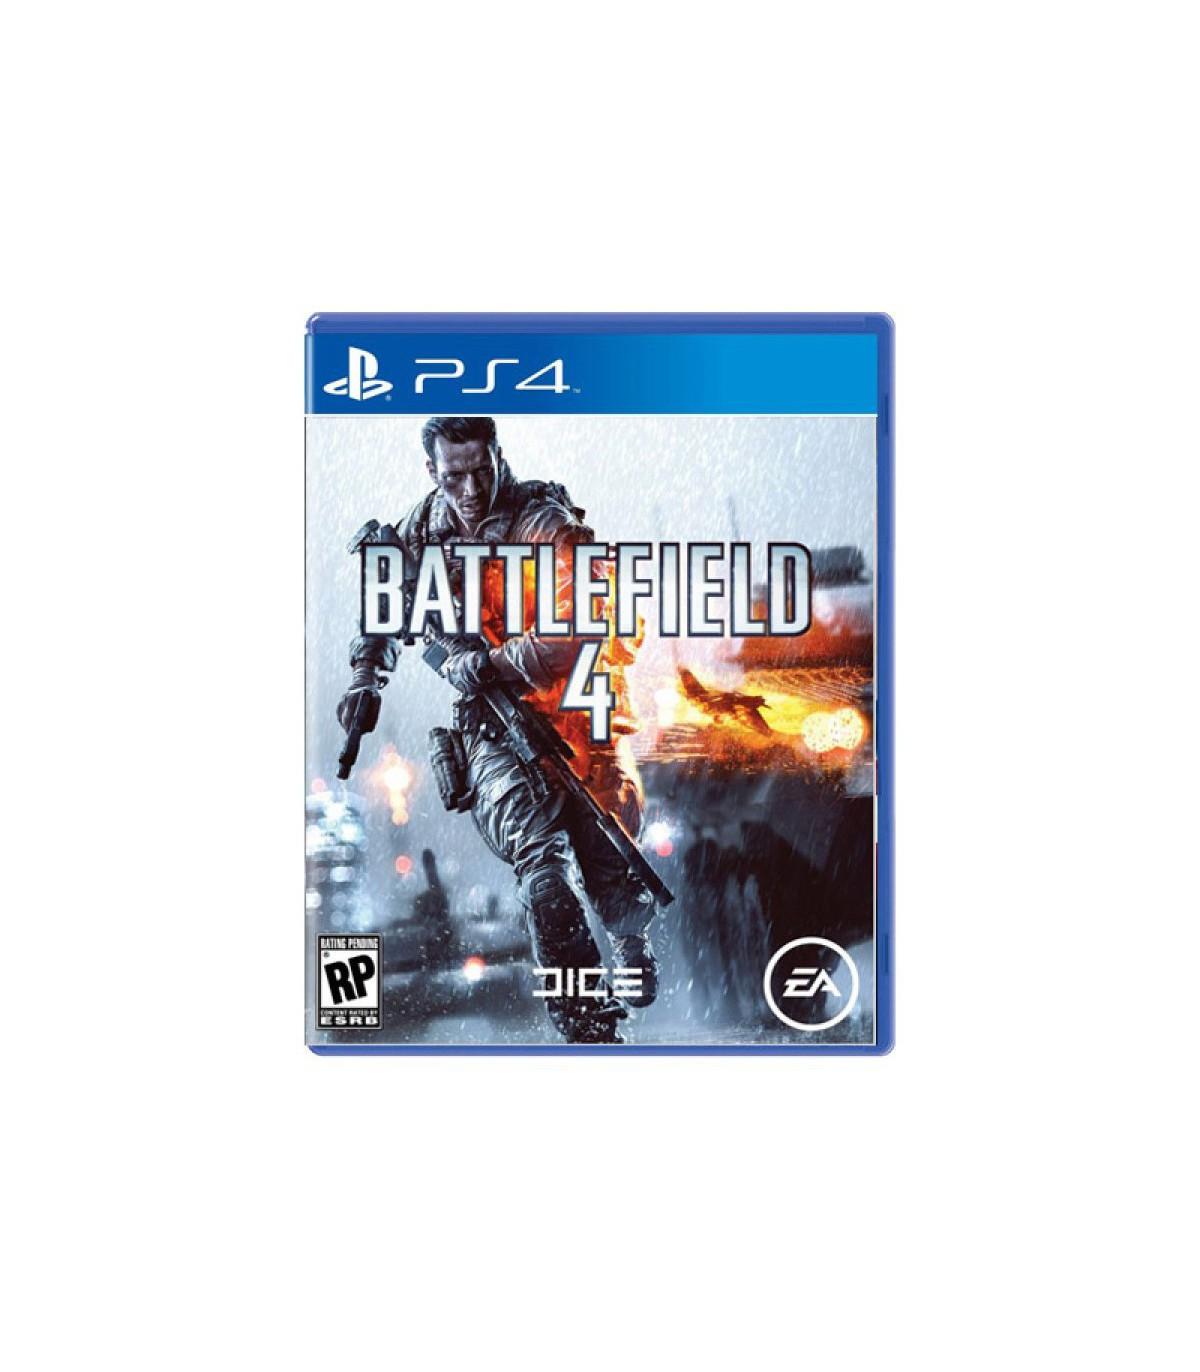 Battlefield 4 - پلی استیشن ۴